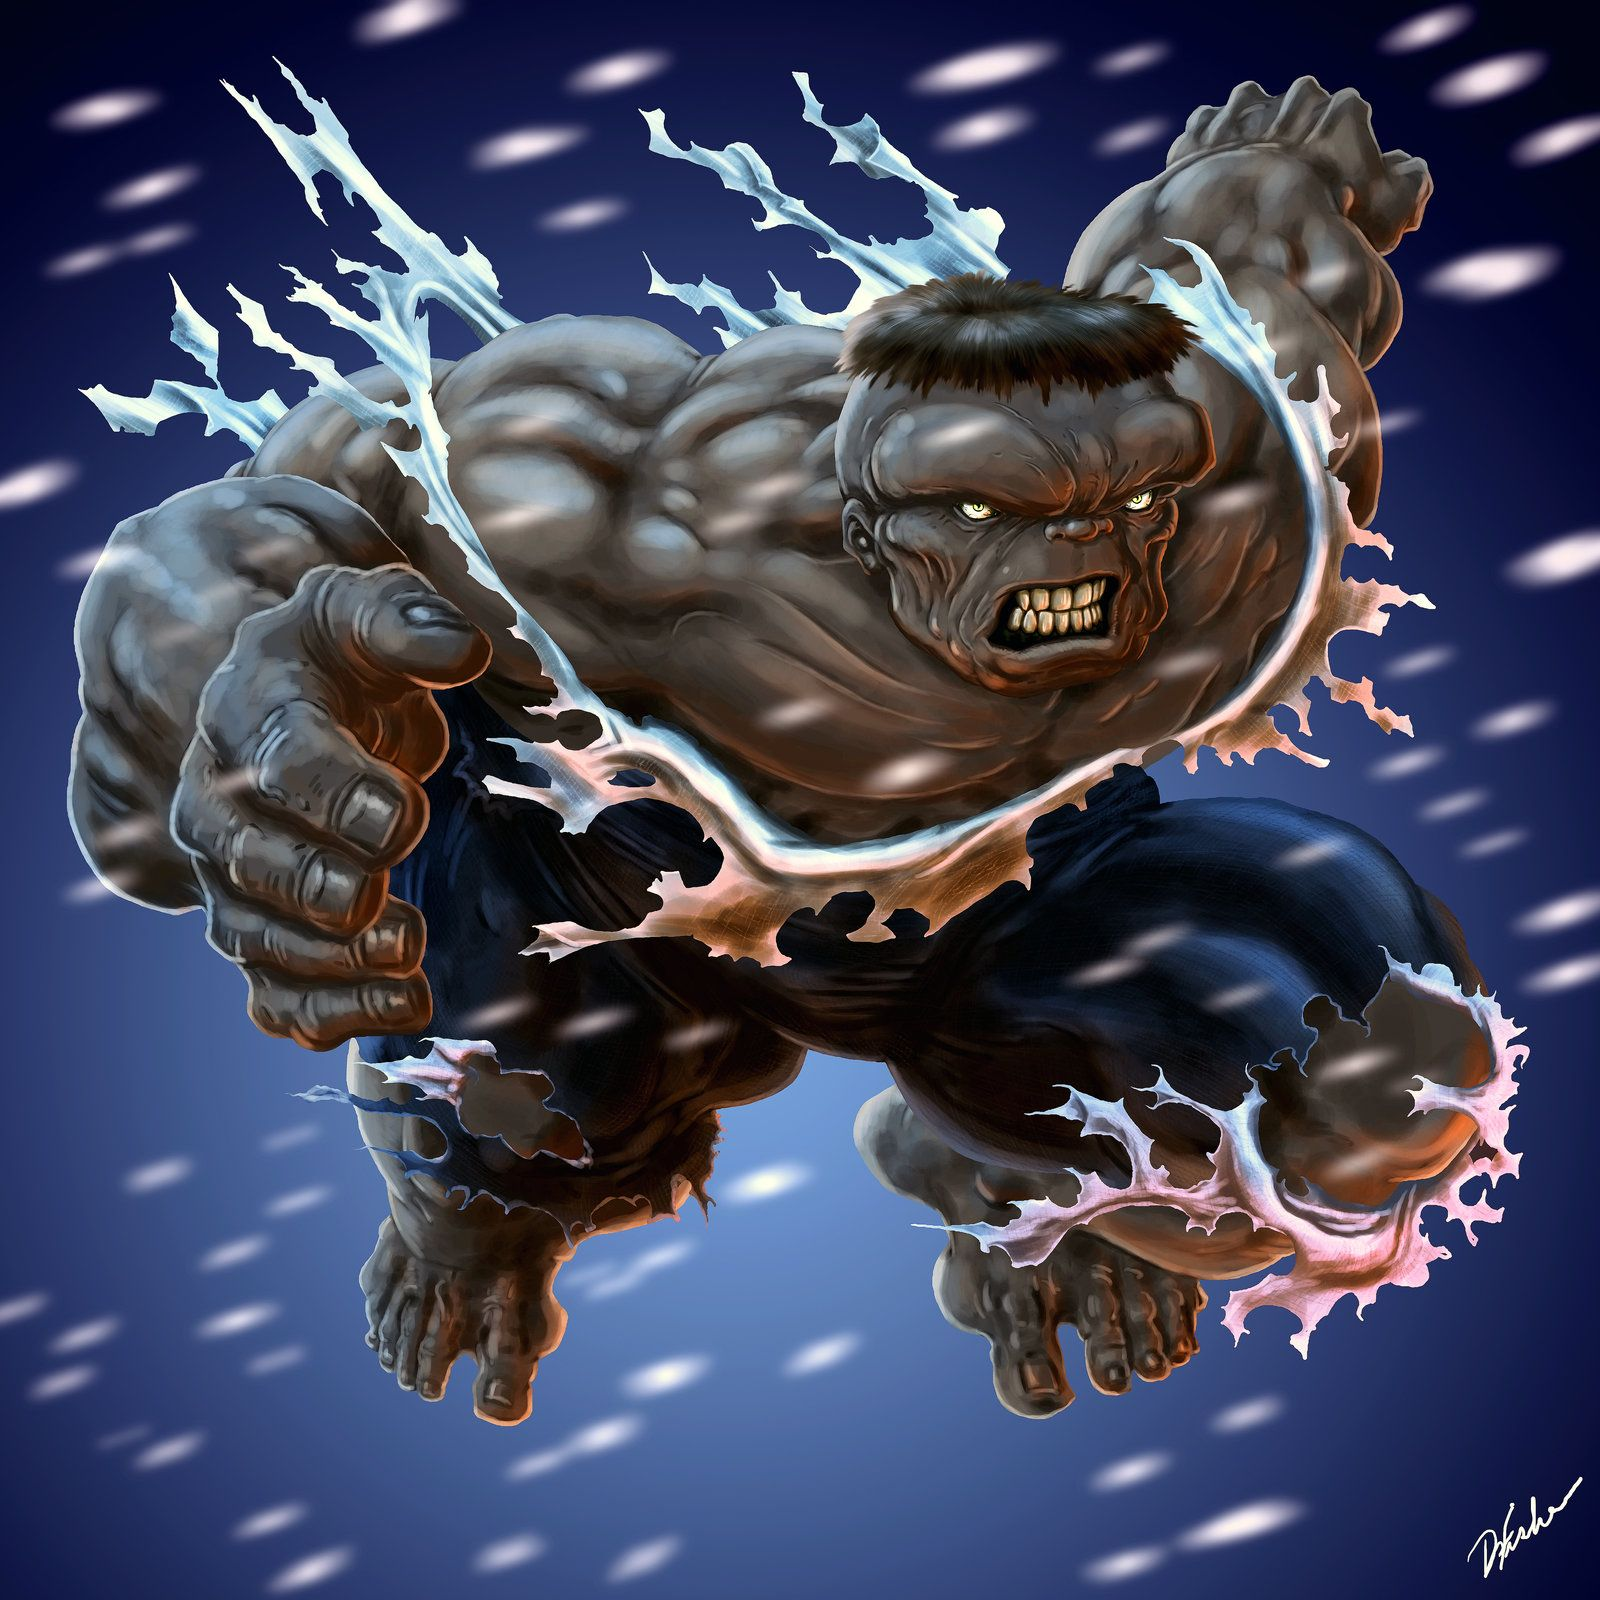 #Hulk #Fan #Art. (Gray Hulk) By: DavidWFisher. (THE * 5 * STÅR * ÅWARD * OF * MAJOR ÅWESOMENESS!!!™)